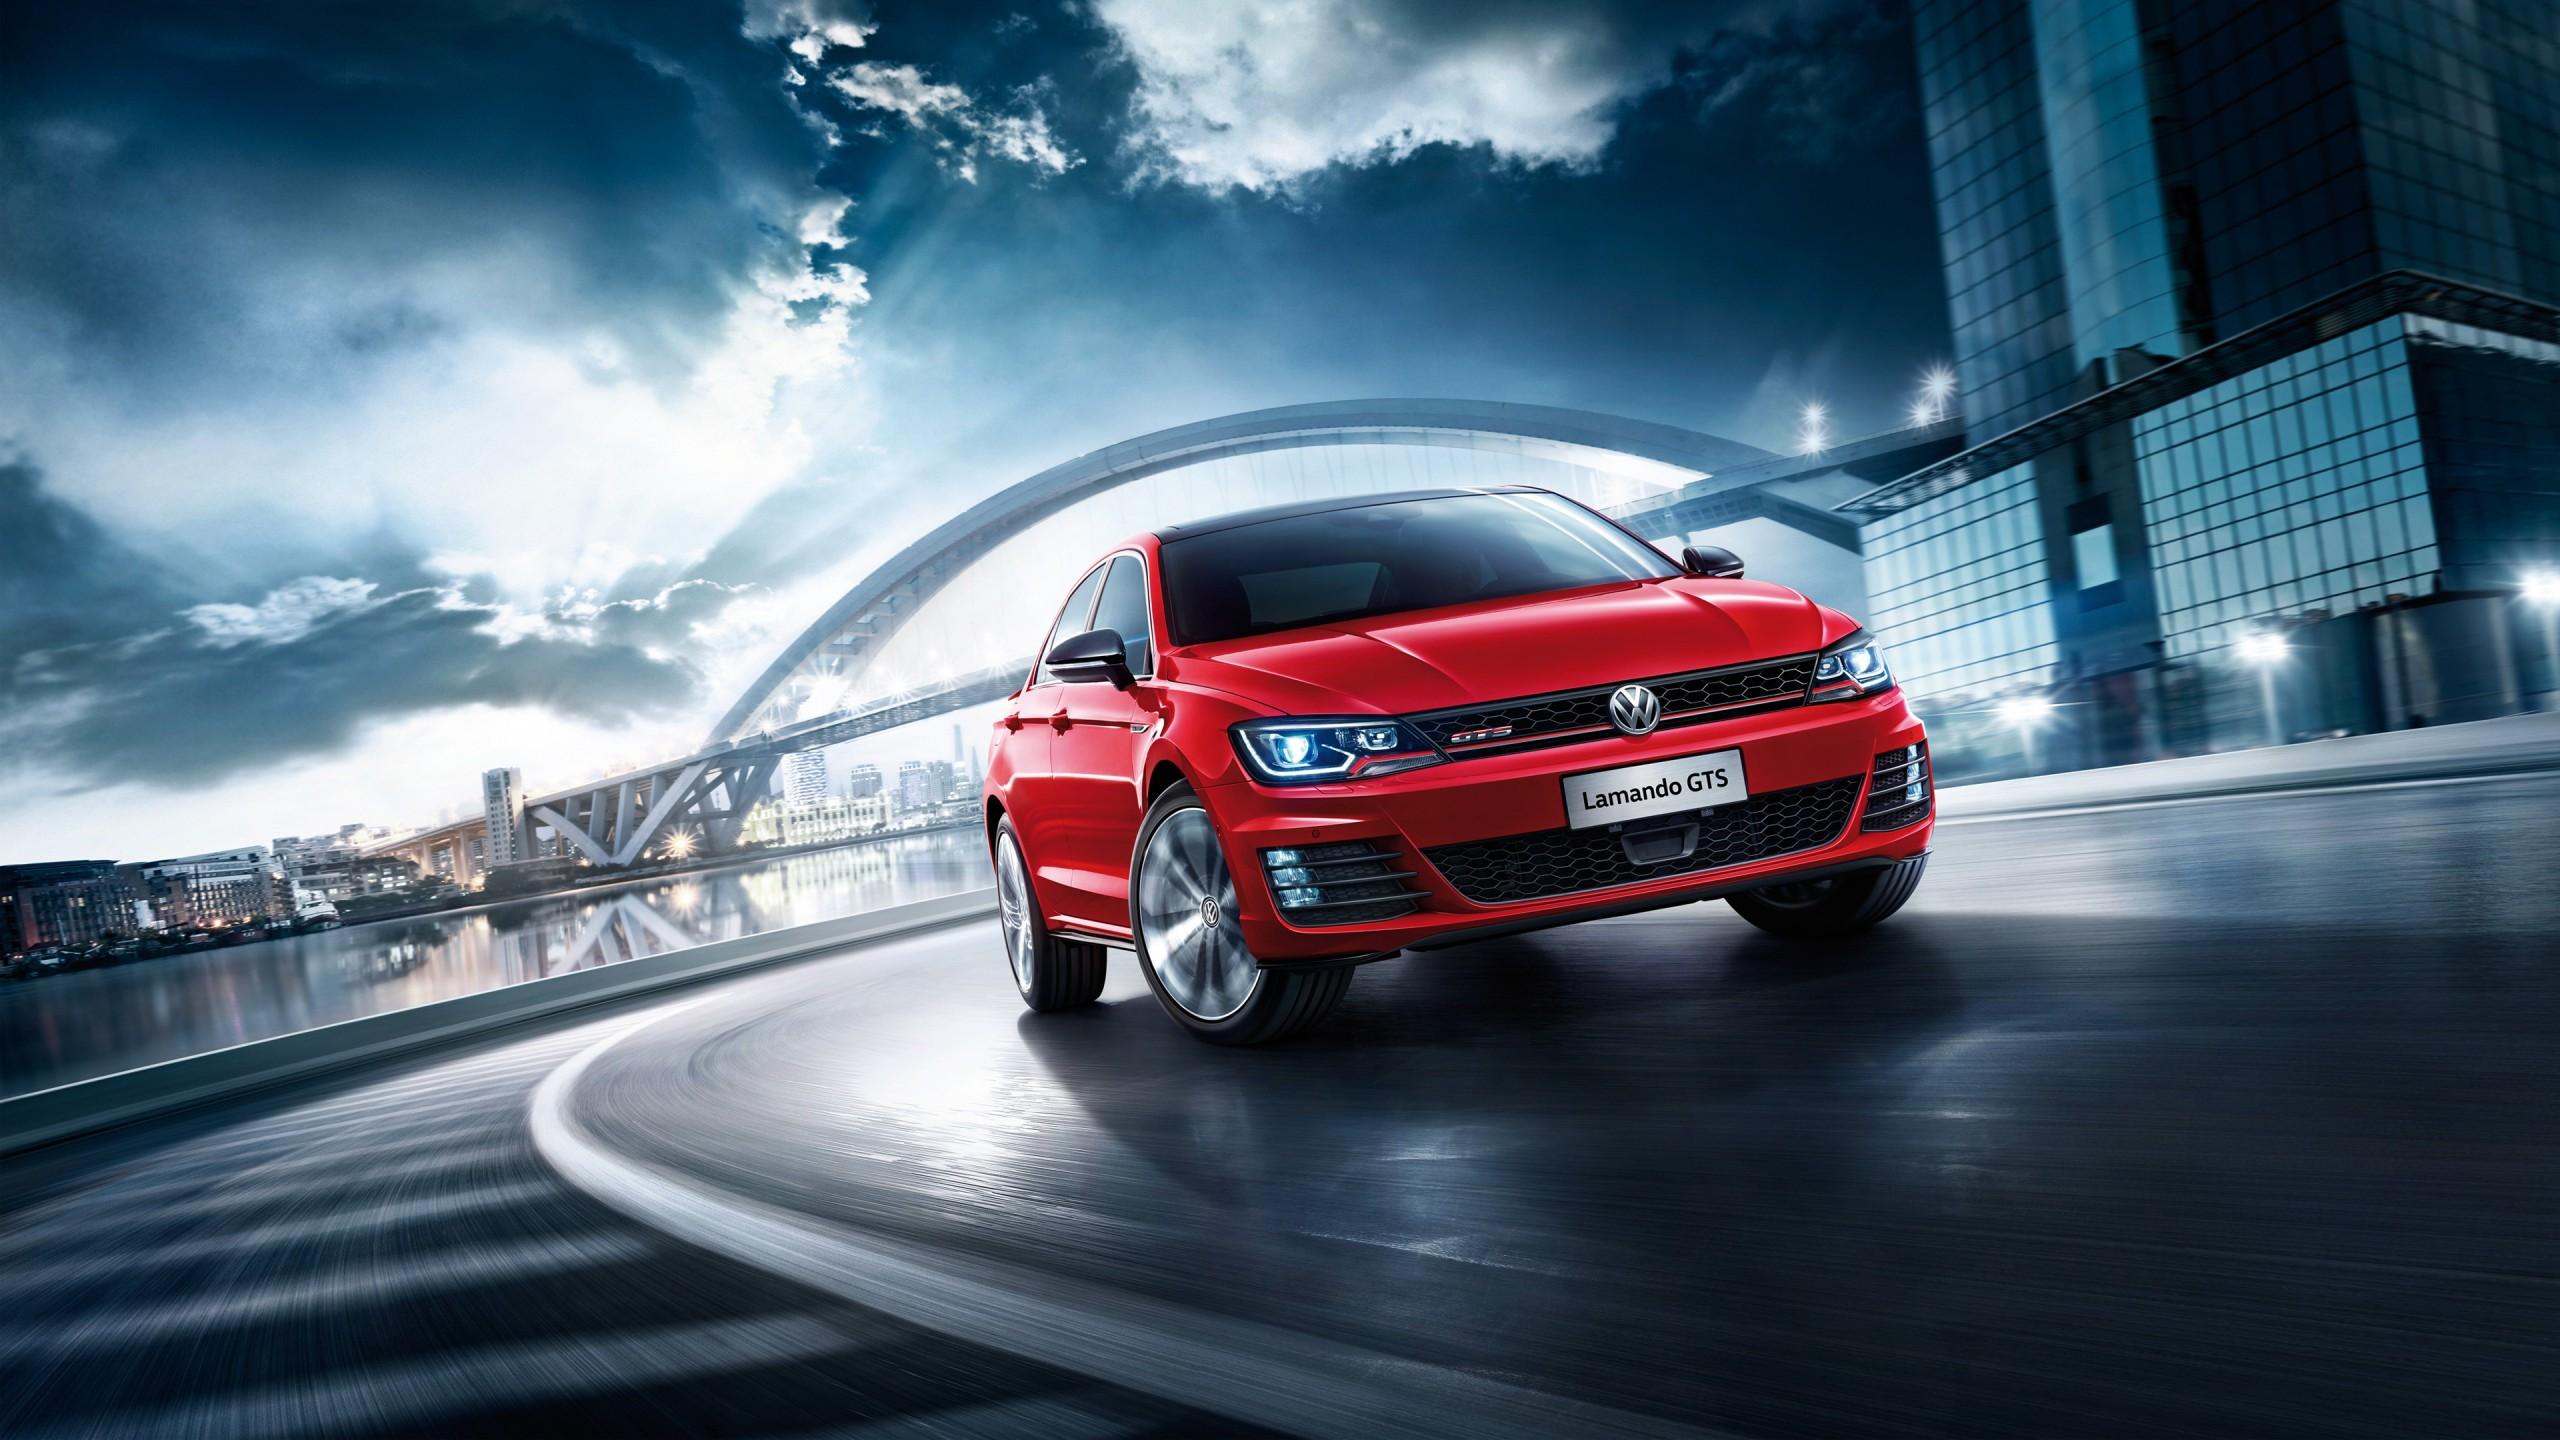 Car Wallpapers Backgrounds Hd: 2017 Volkswagen Lamando GTS Wallpaper